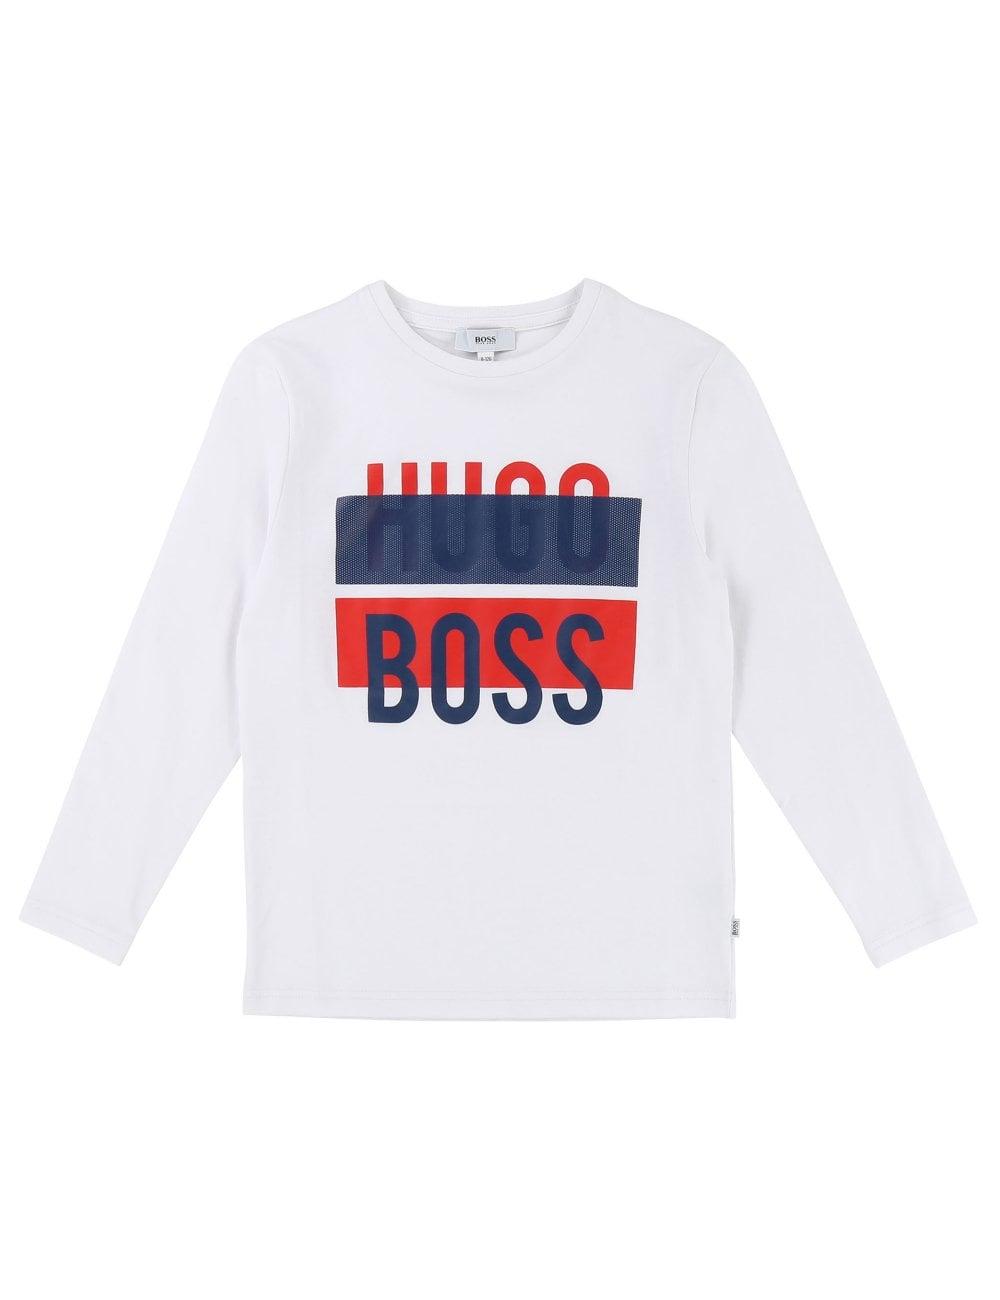 86bb9286b Hugo Boss Kids Crew Neck Boys Long Sleeve Tee